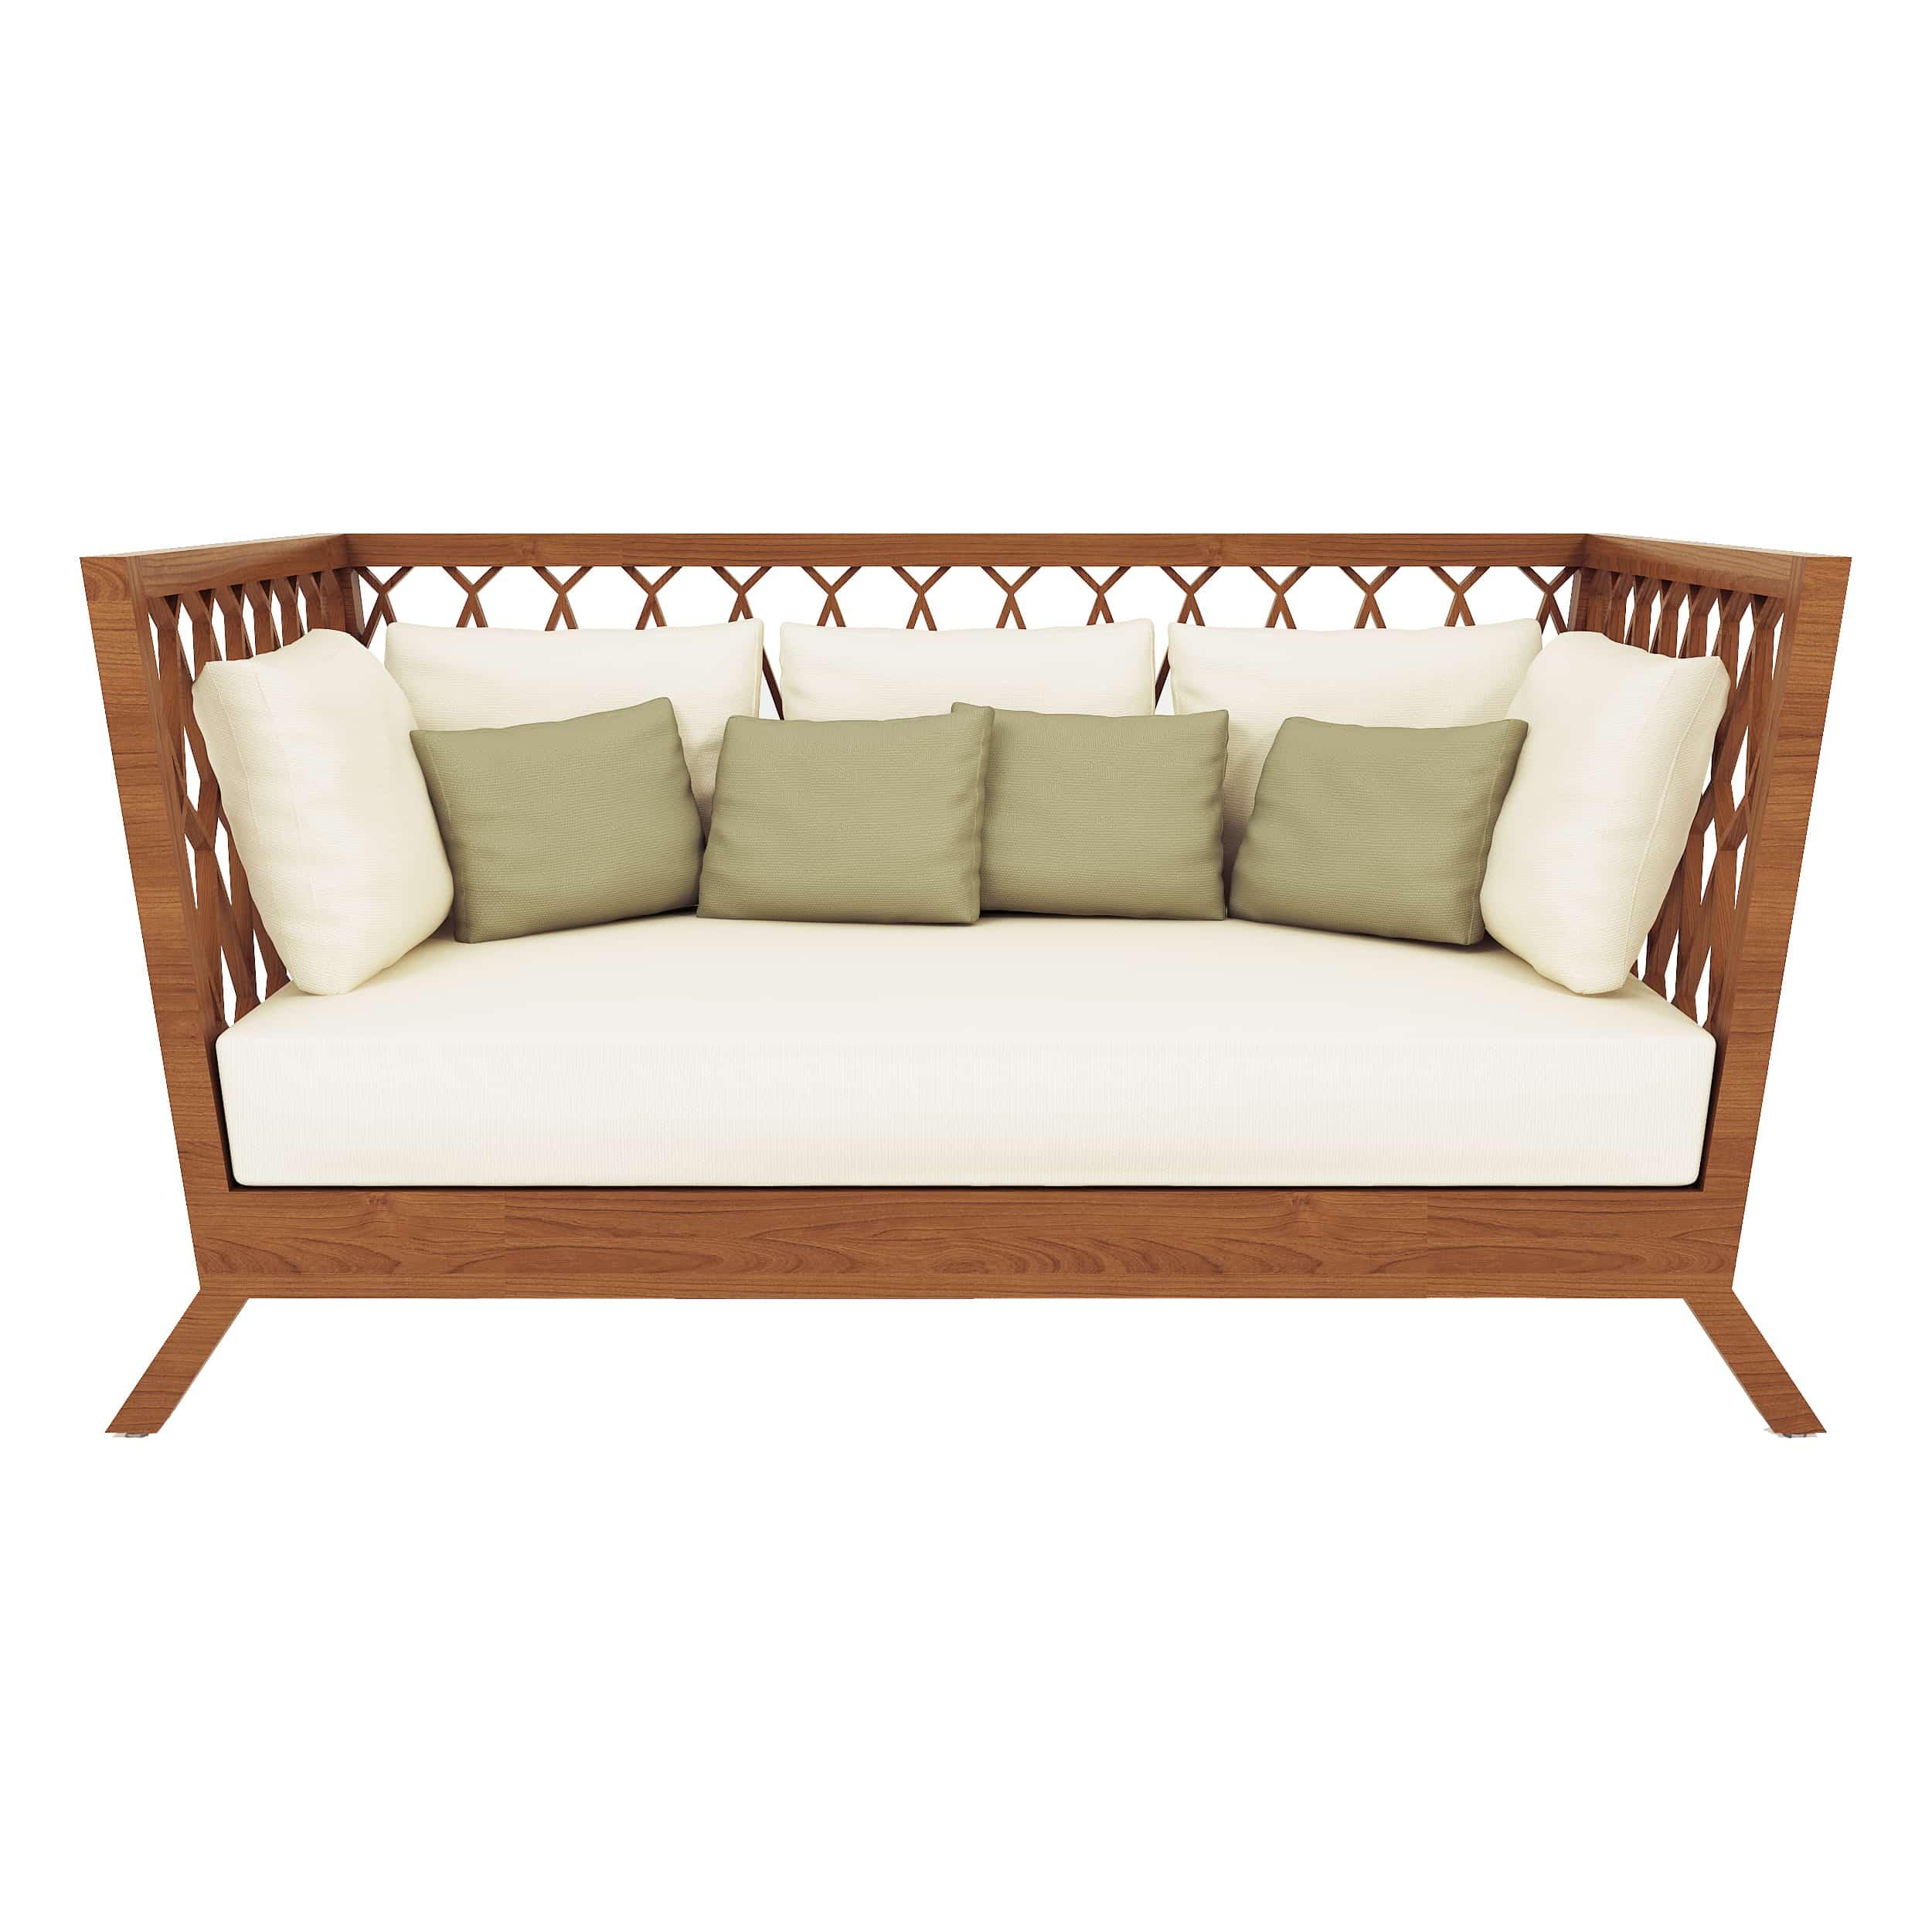 Cutout Sofa